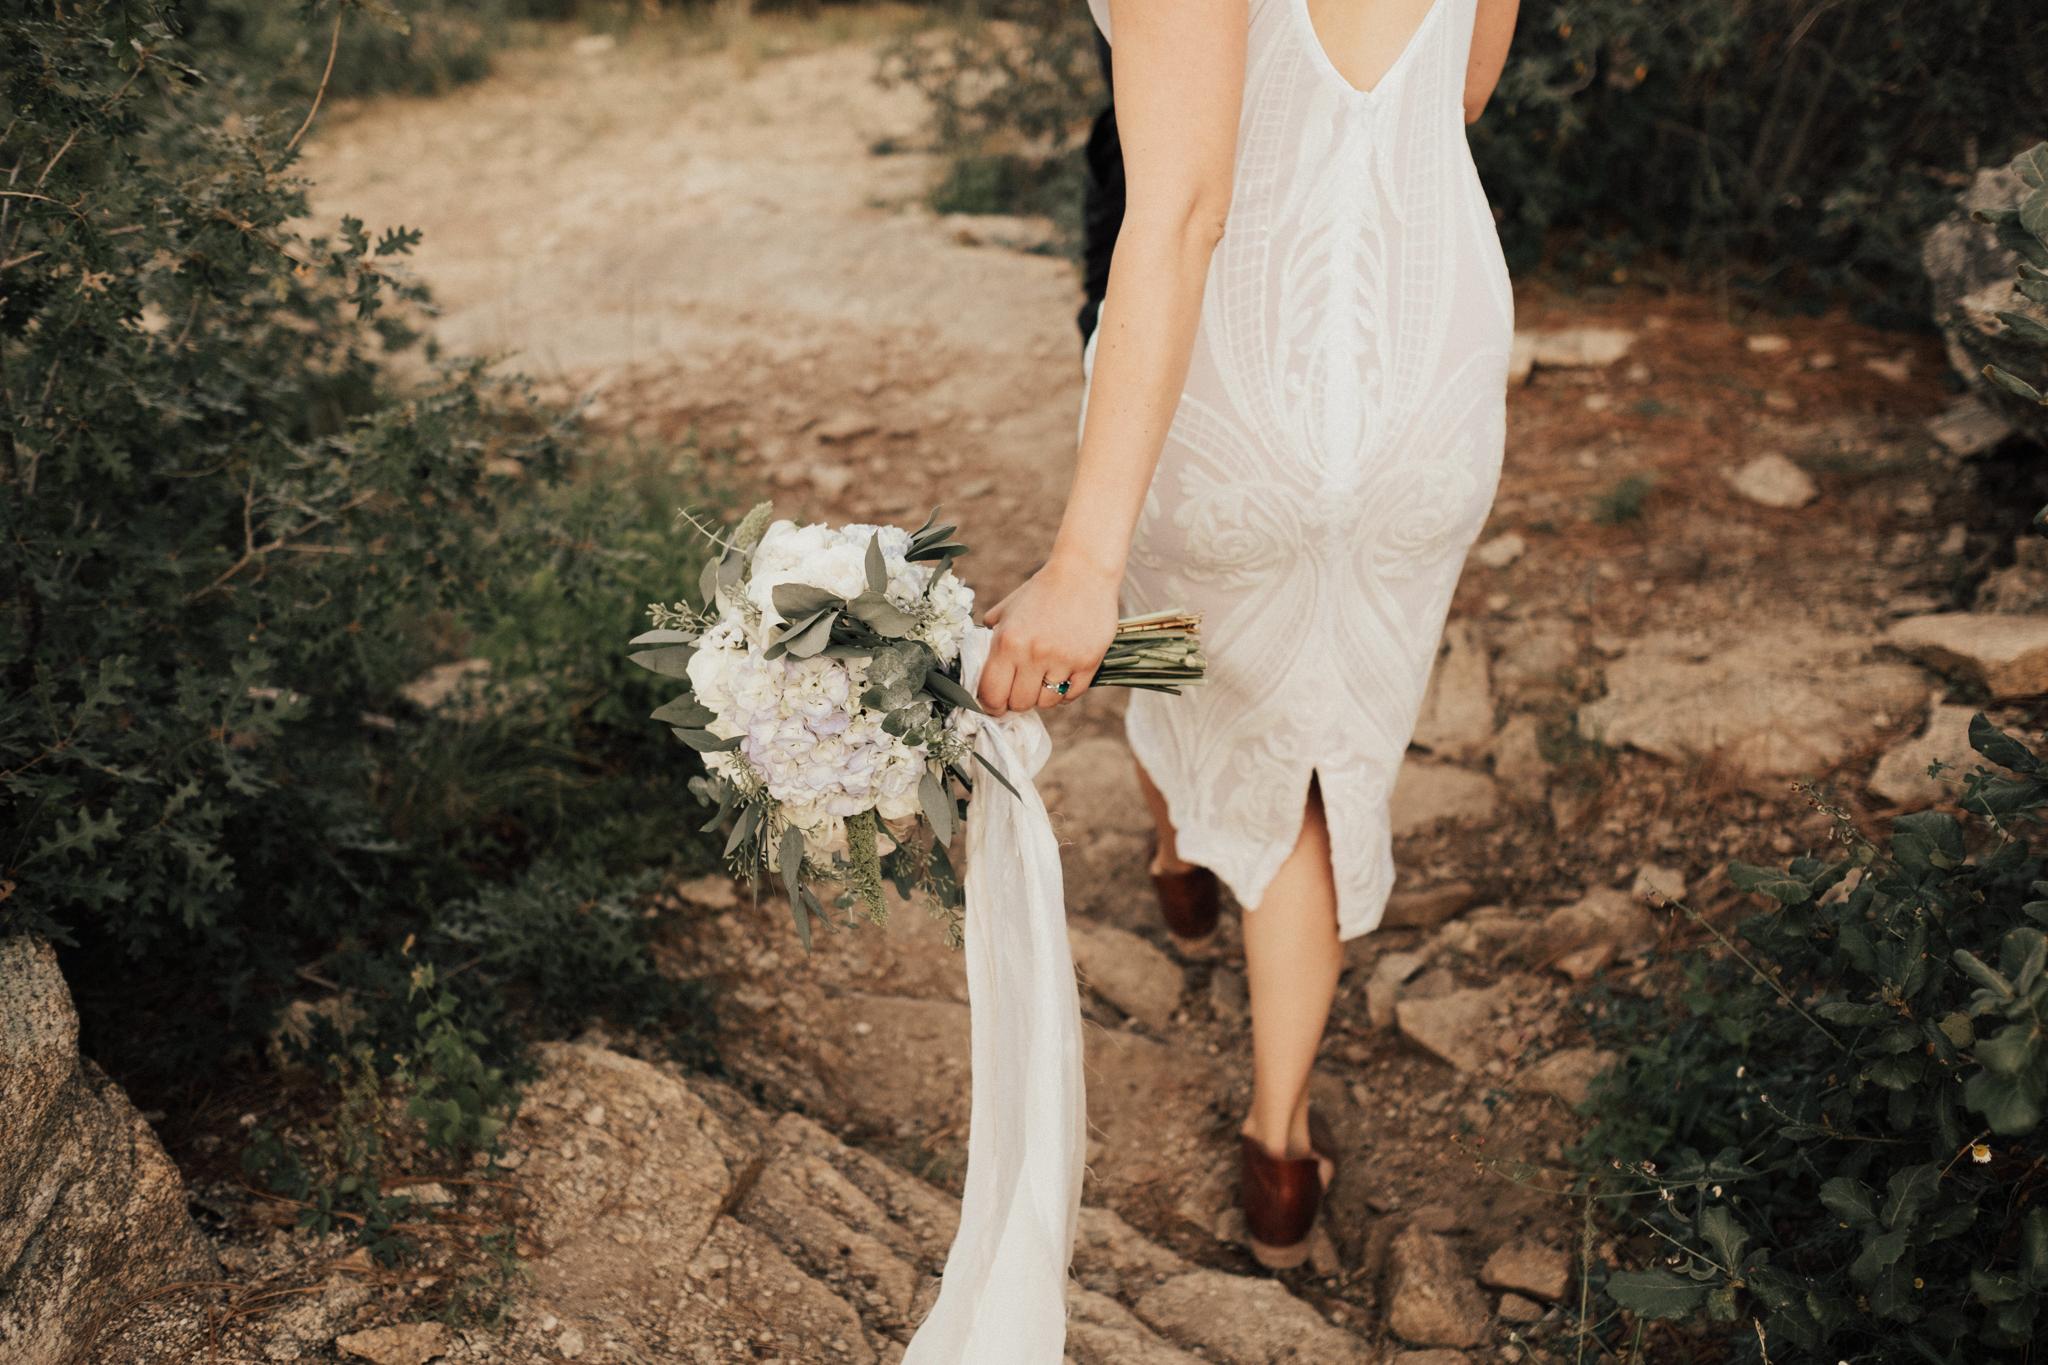 Arizona-Adventure-Elopement-Wedding-Photographer-72.jpg